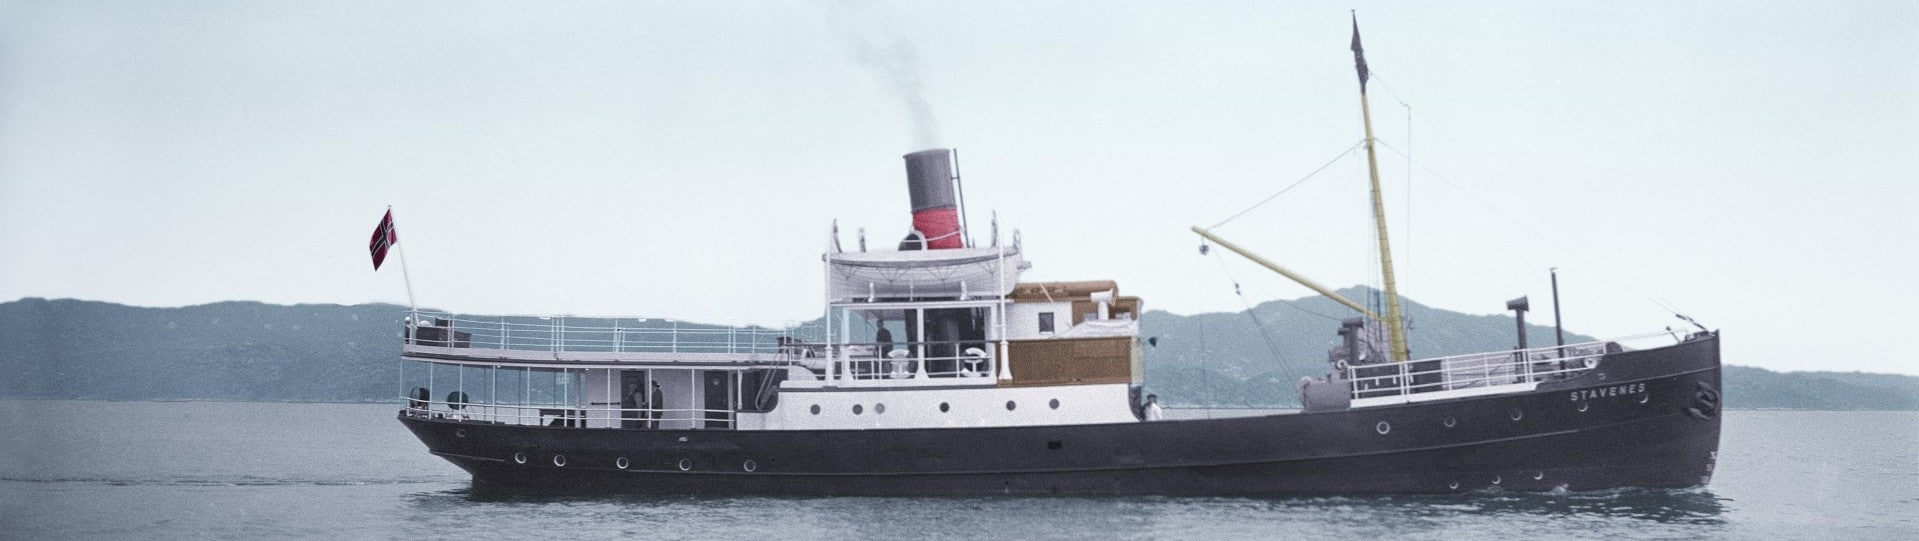 Fjordsteam 1.-4. august